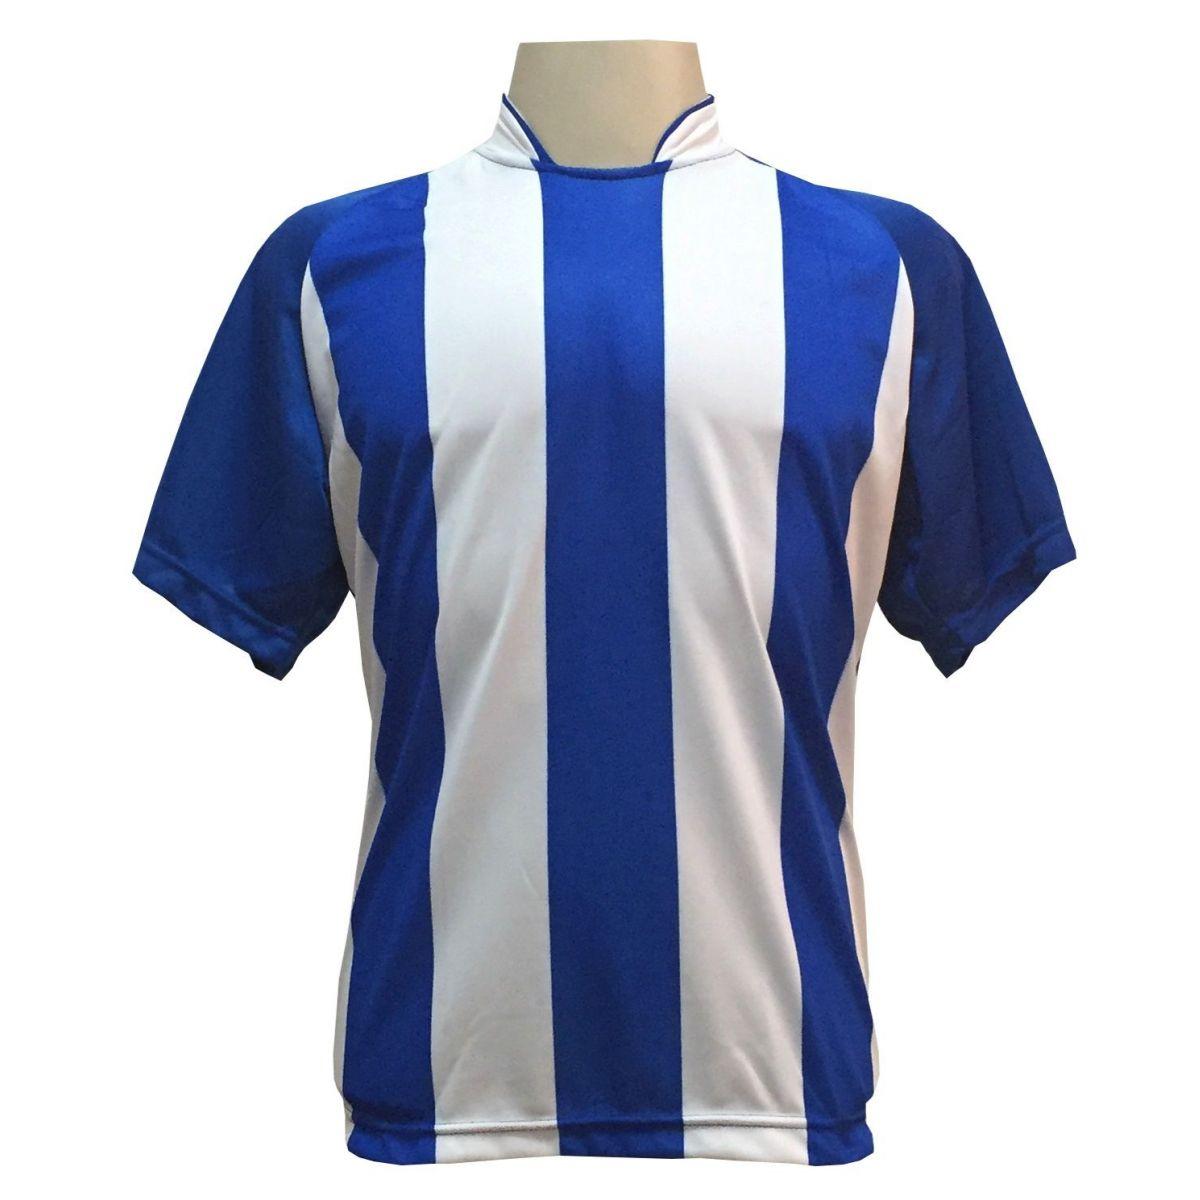 Jogo de Camisa com 12 unidades modelo Milan Royal/Branco + 1 Goleiro + Brindes